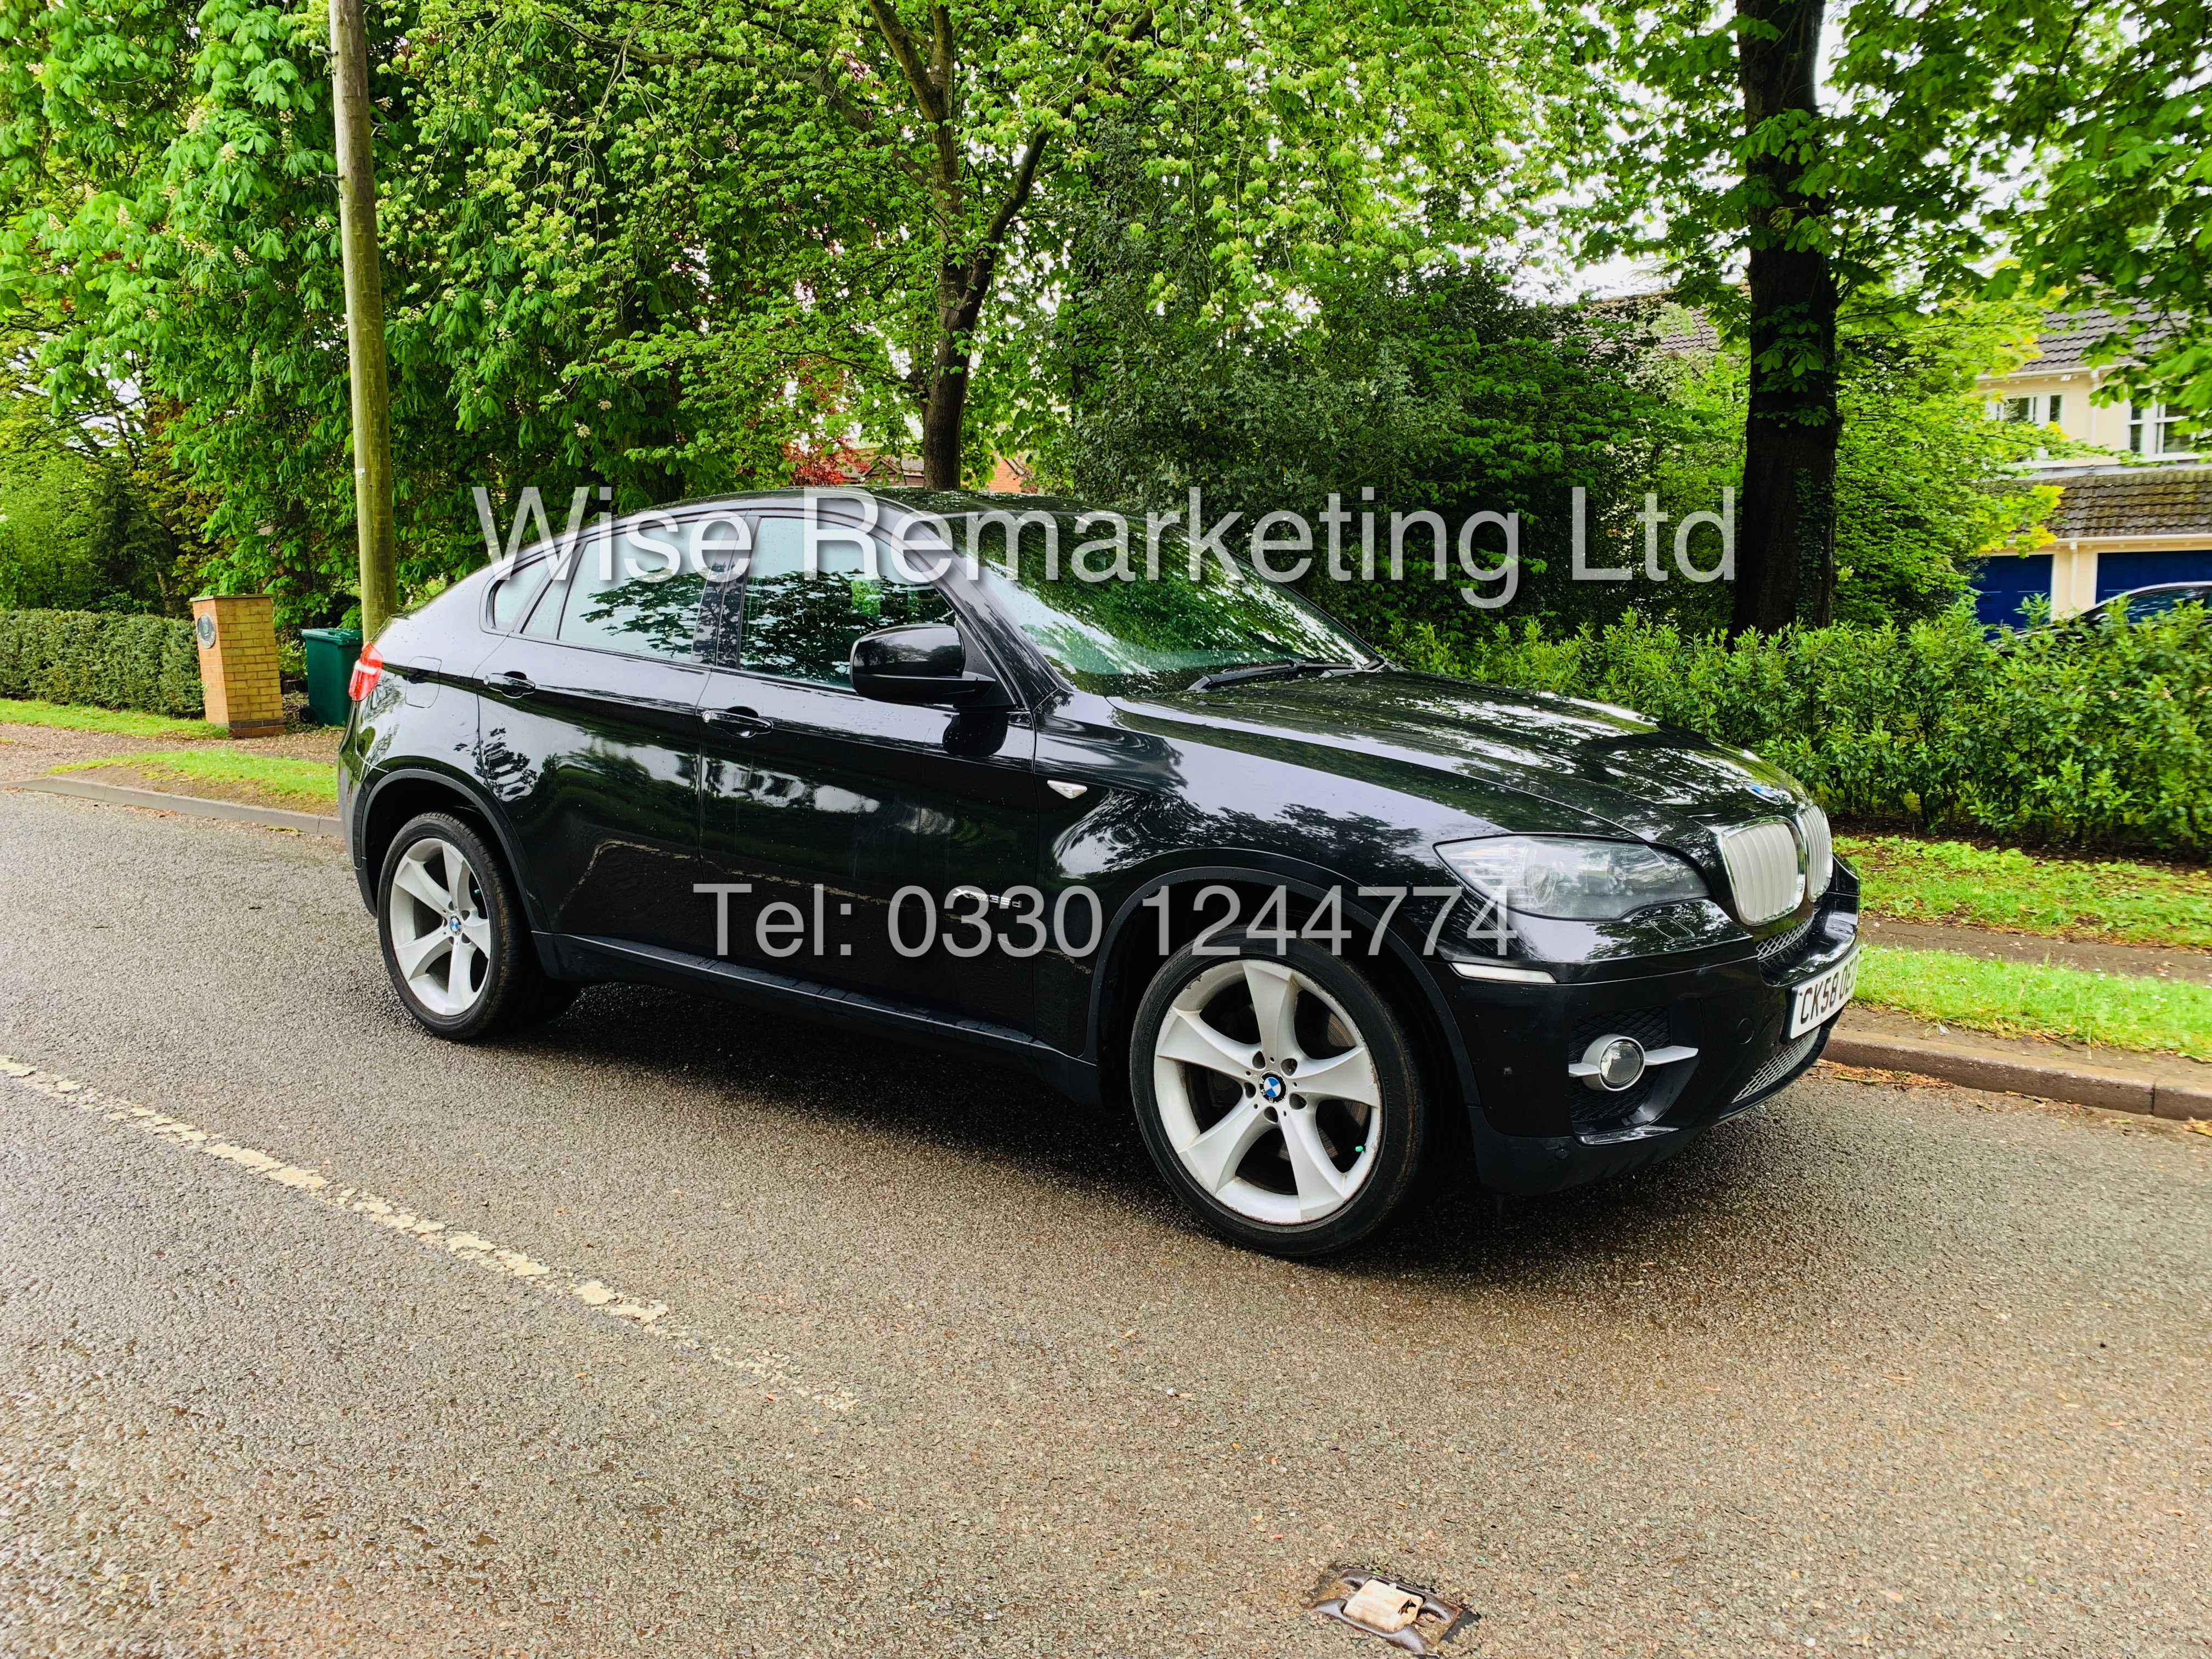 BMW X6 XDRIVE 35D AUTO (2009 SPEC) *1 PREVIOUS OWNER* PARKING AID - SAT NAV - FSH - Image 7 of 25